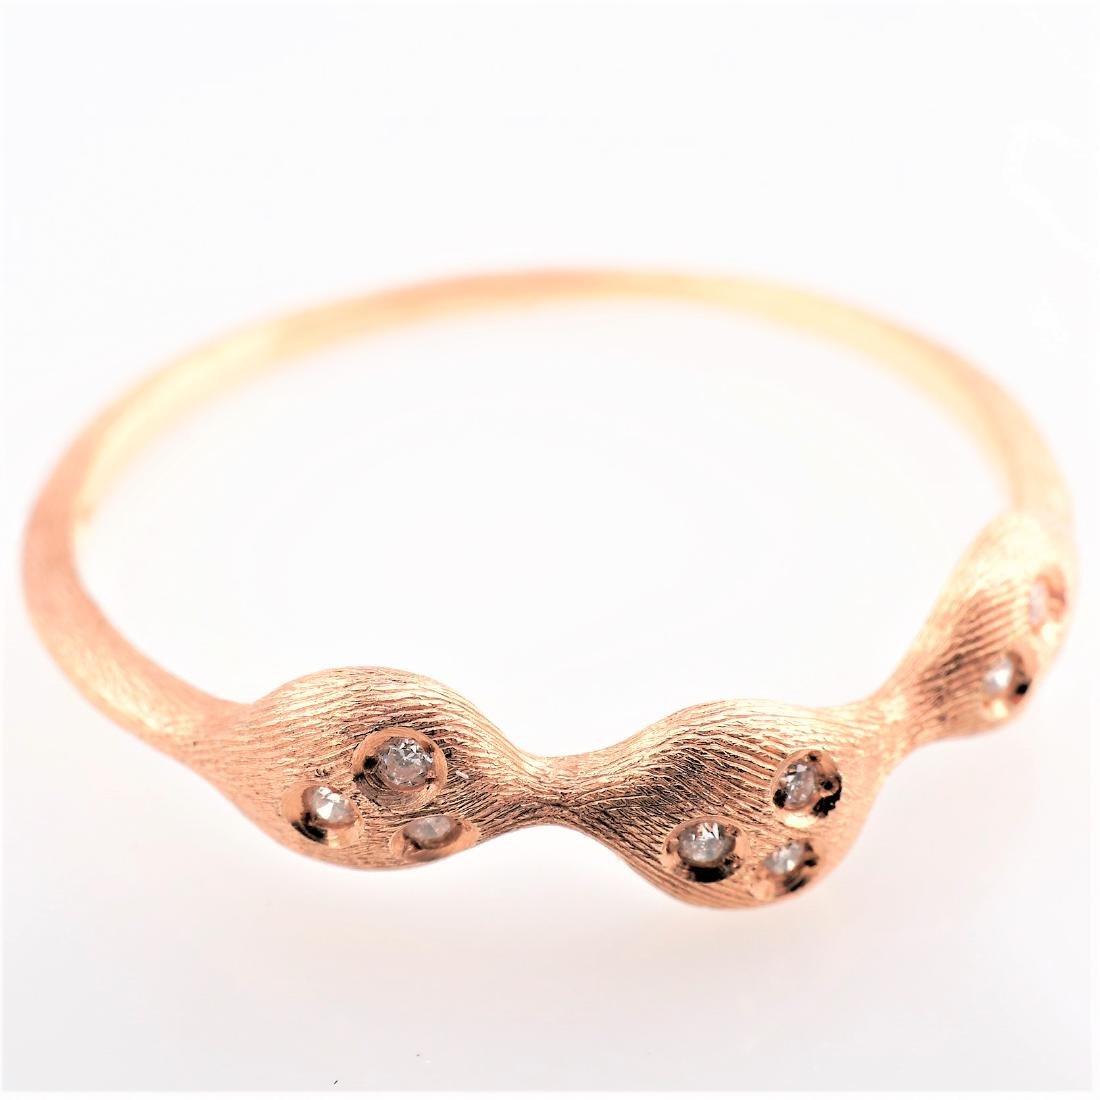 14K RG Nanis Diamond Ring sz 7.75